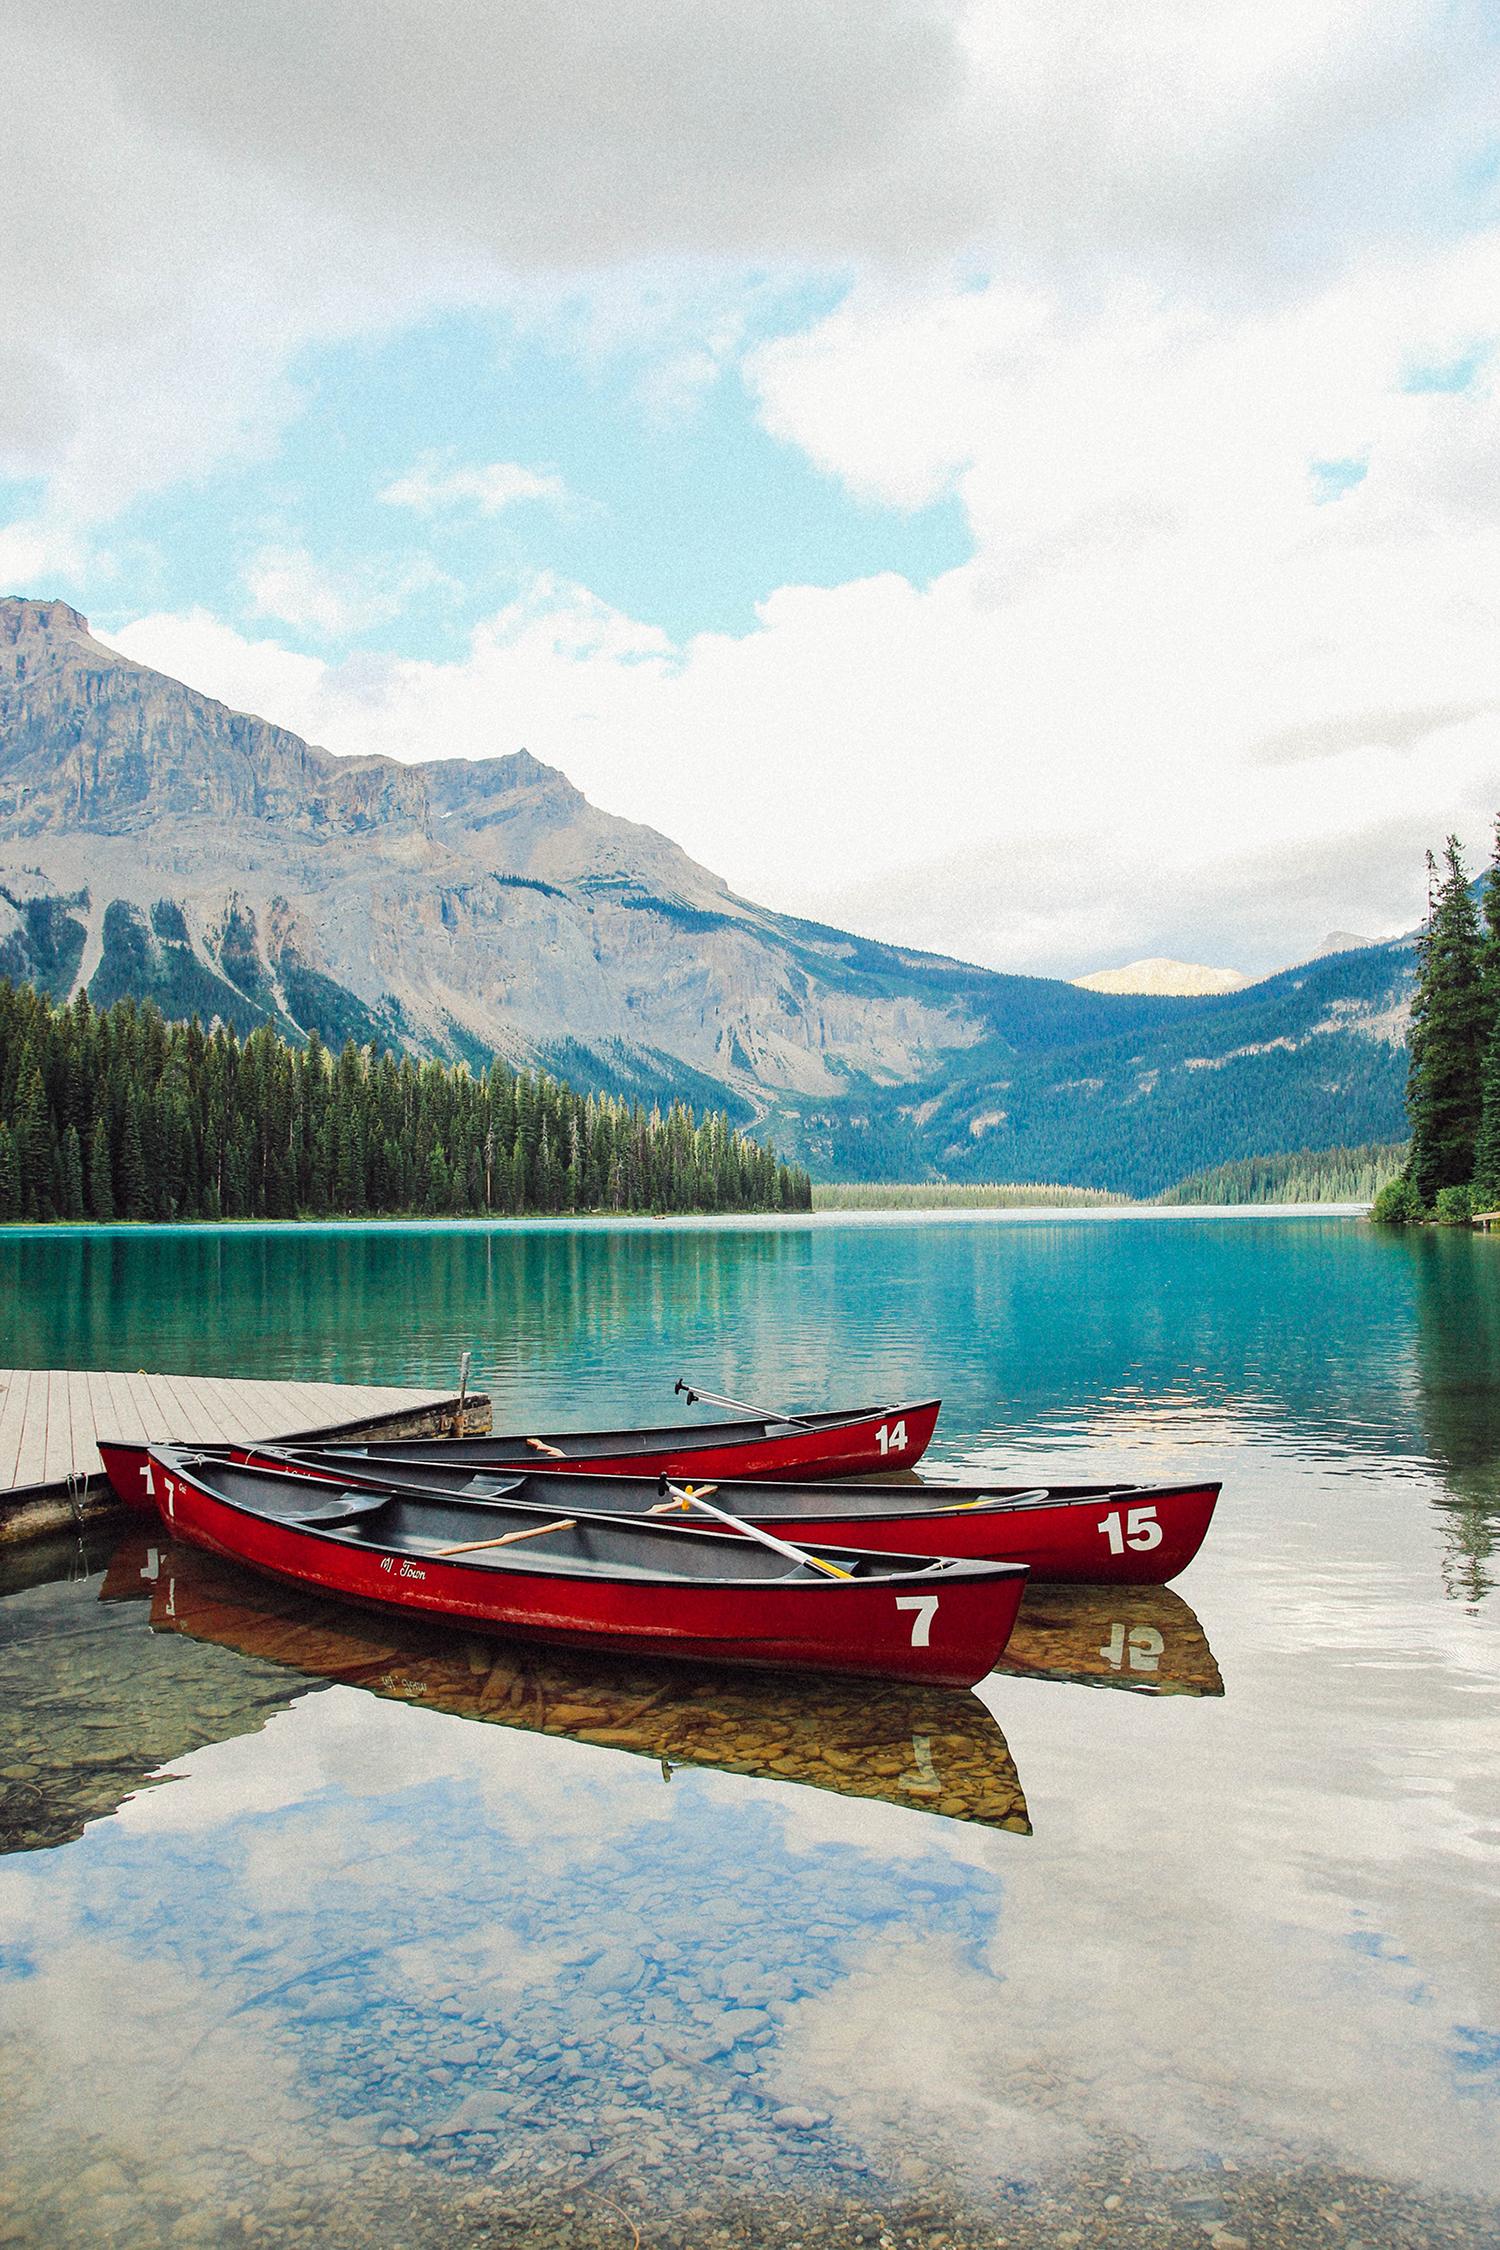 Lake Morraine